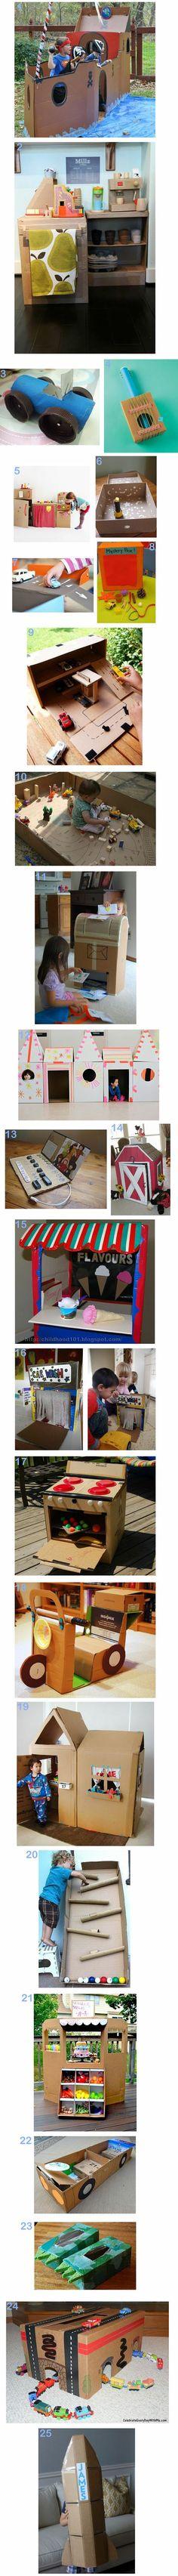 25 Fun Ideas for a Cardboard Box. Mind blown..